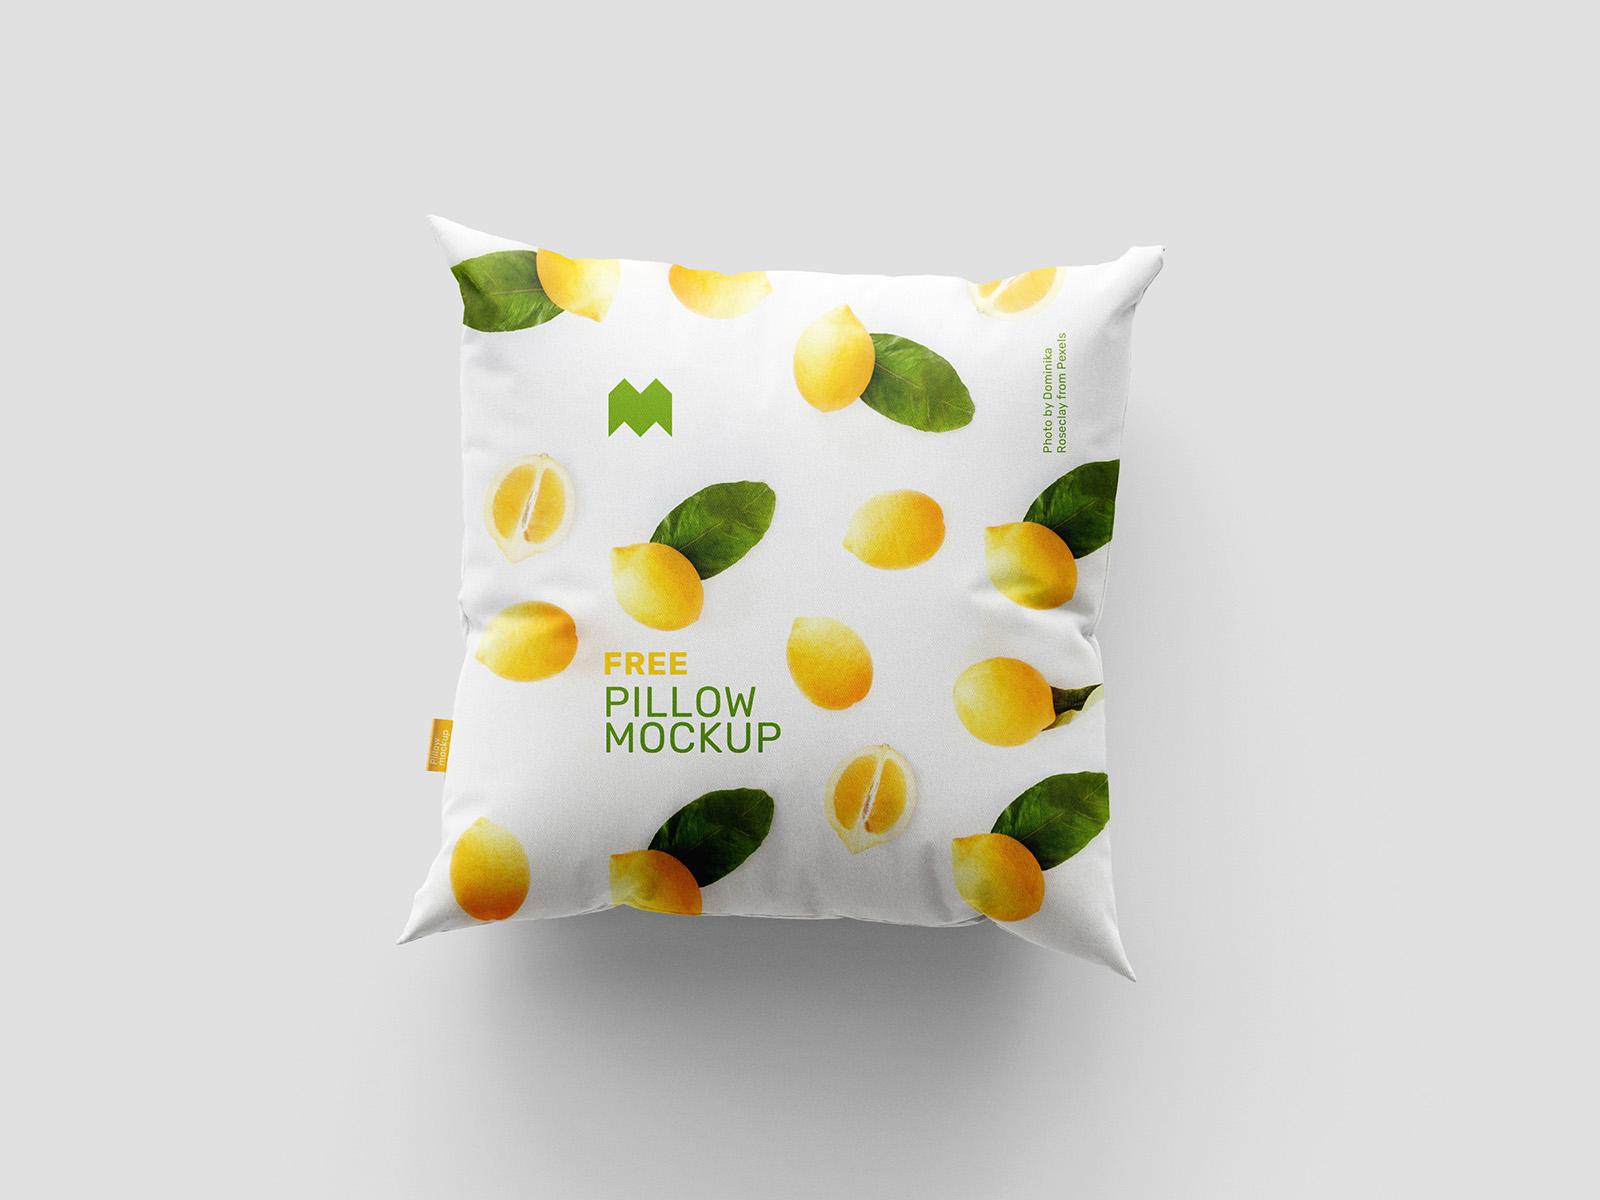 Free square pillow mockup